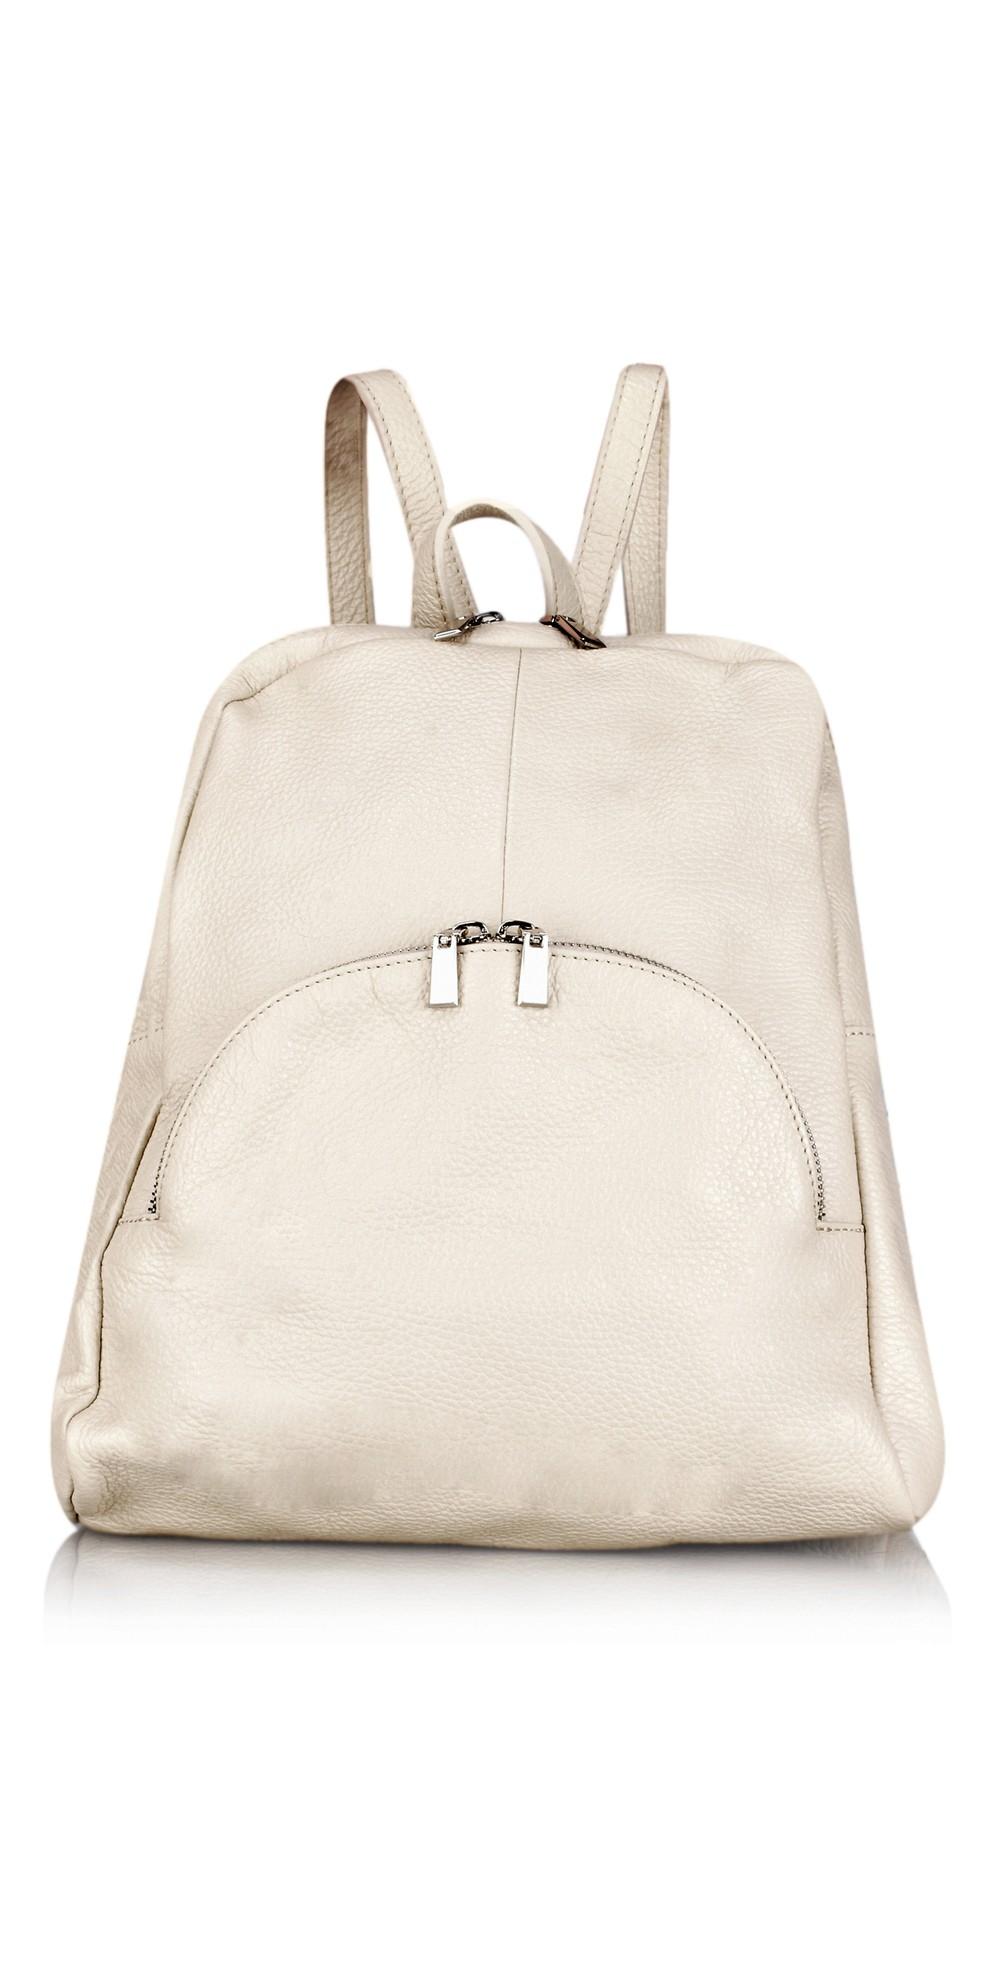 Salerno Leather Backpack main image